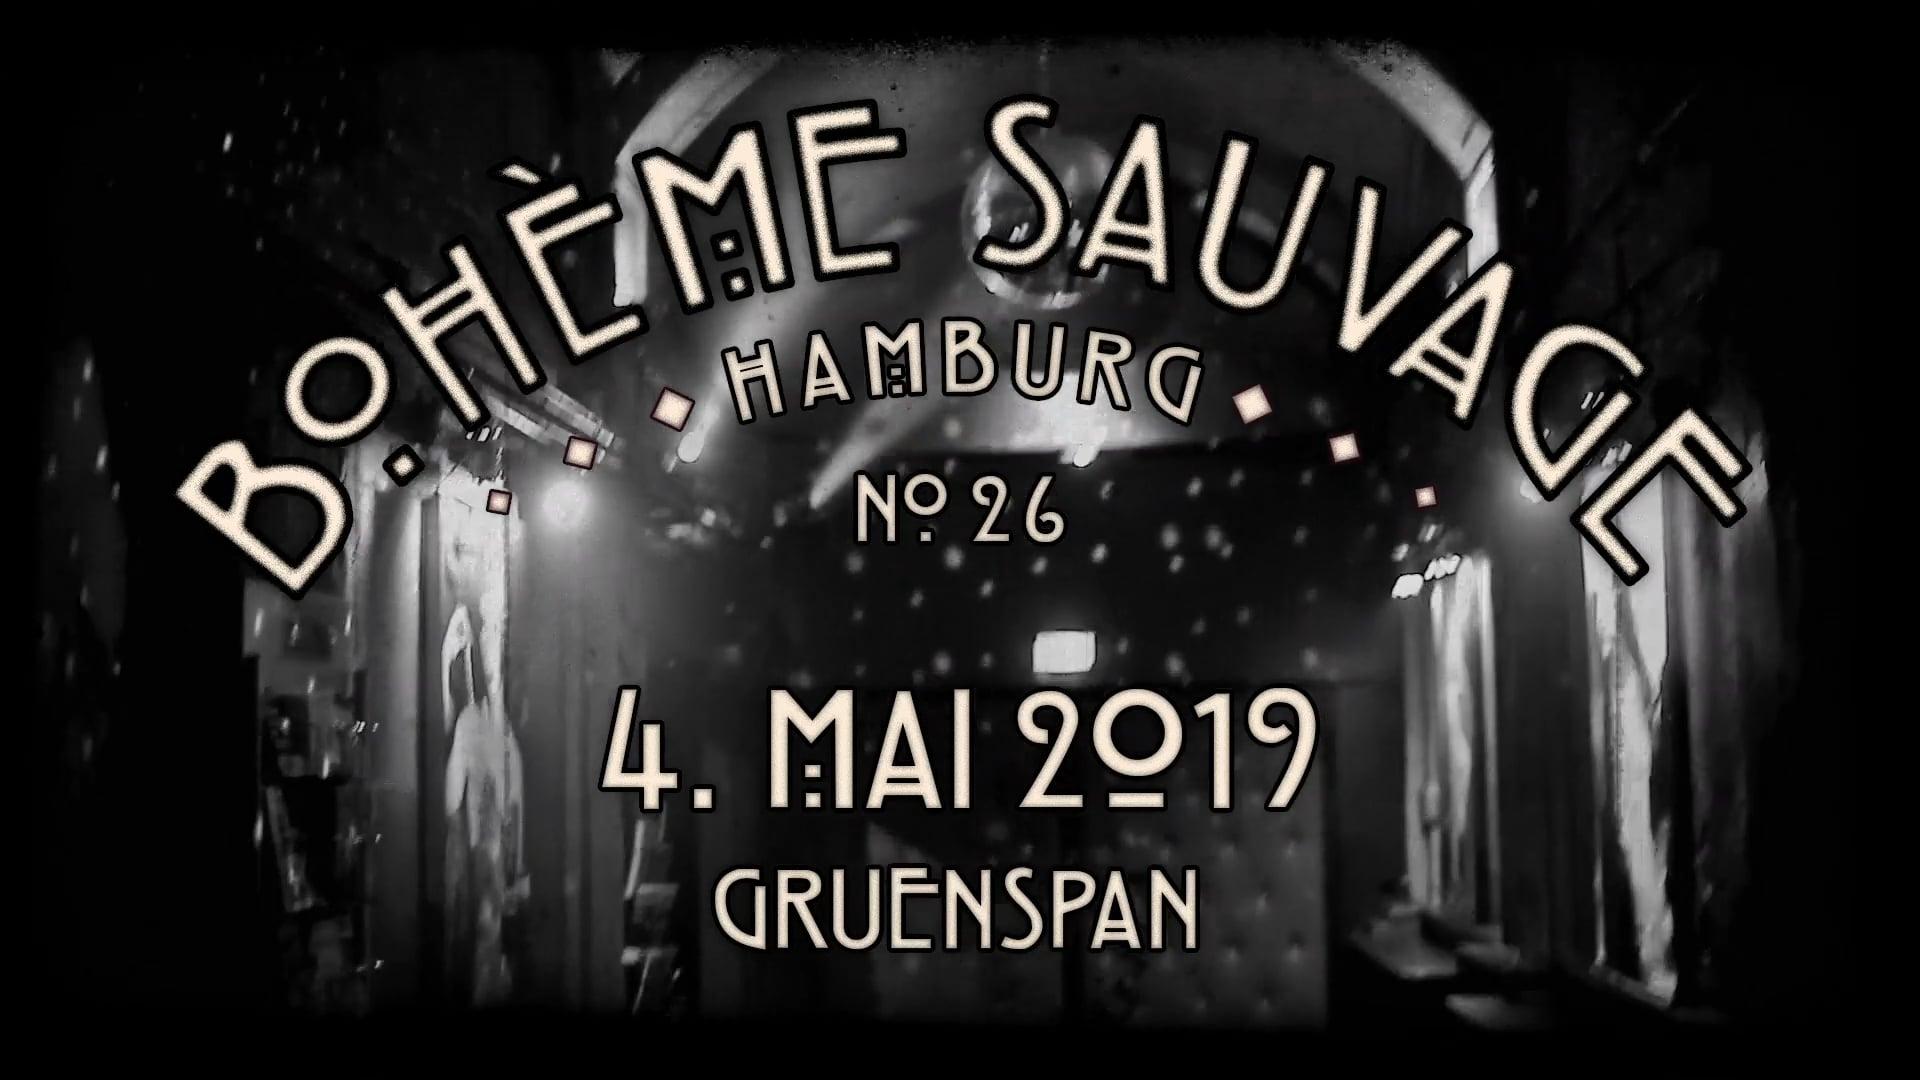 Bohème Sauvage Hamburg Nº26 - 4. Mai 2019 - Gruenspan